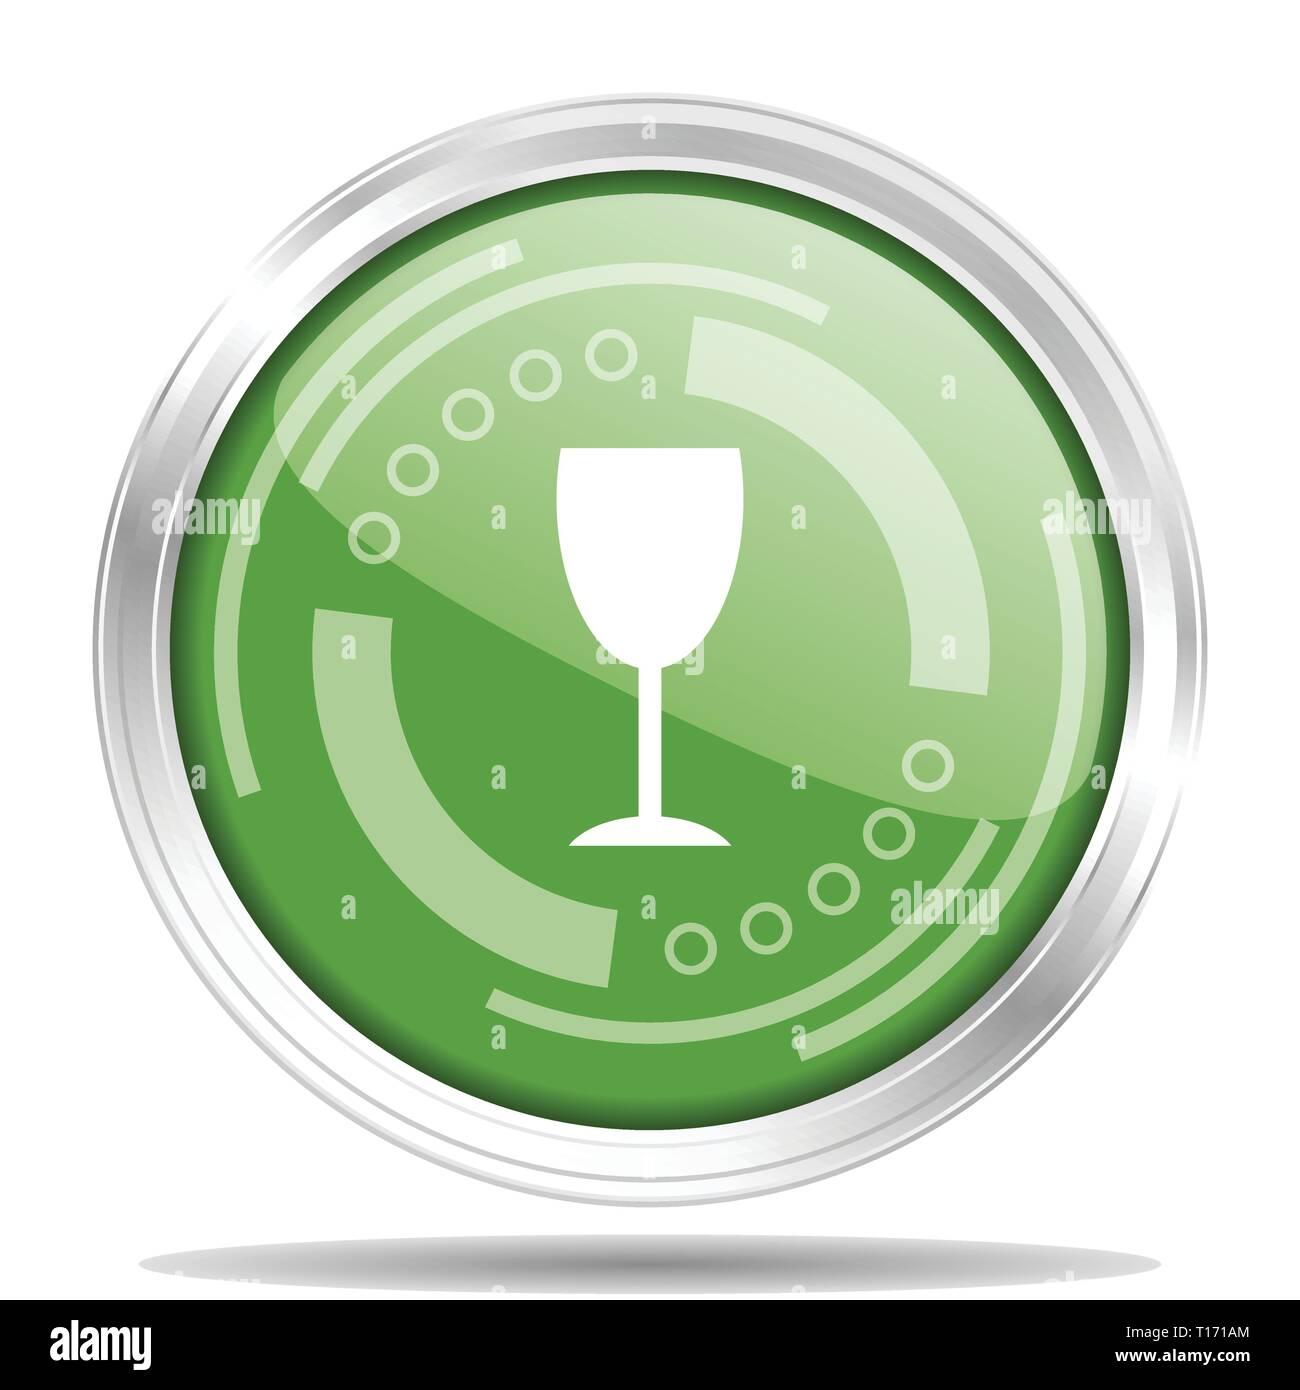 ba87afcc9c0 Alcohol silver metallic chrome border round web icon